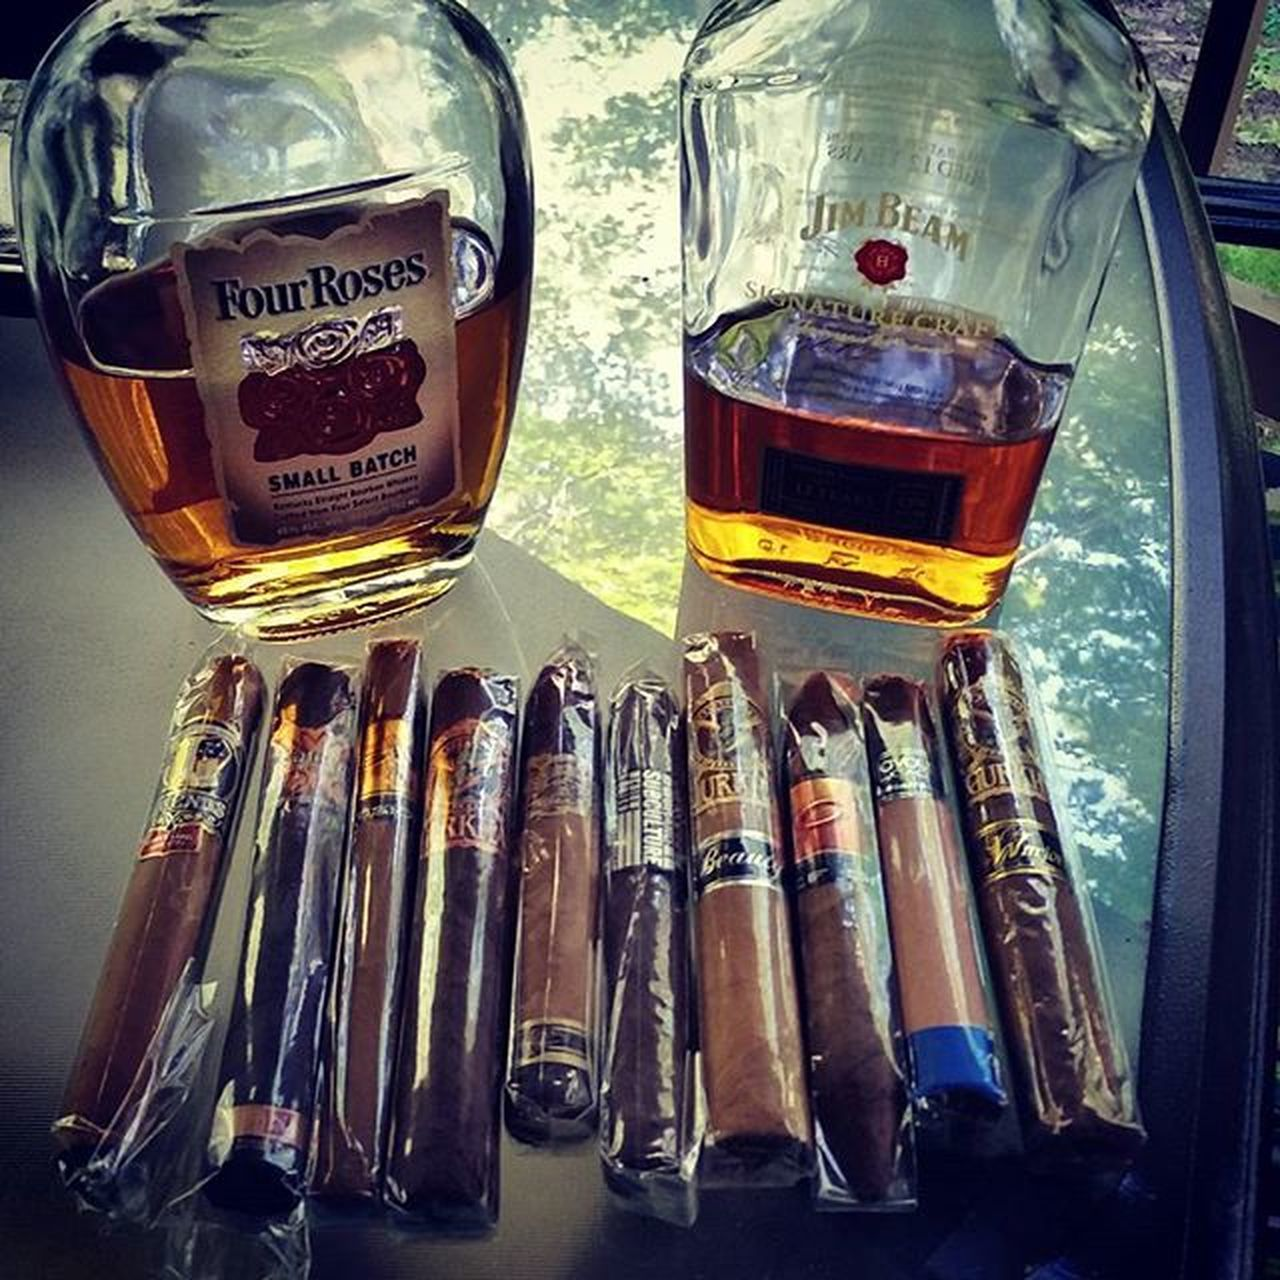 Decisions decisions Cigarsandbourbon Cigars Finerthings Relaxing Acidcigars 4rosesbourbon Jimbeam Gurkacigars